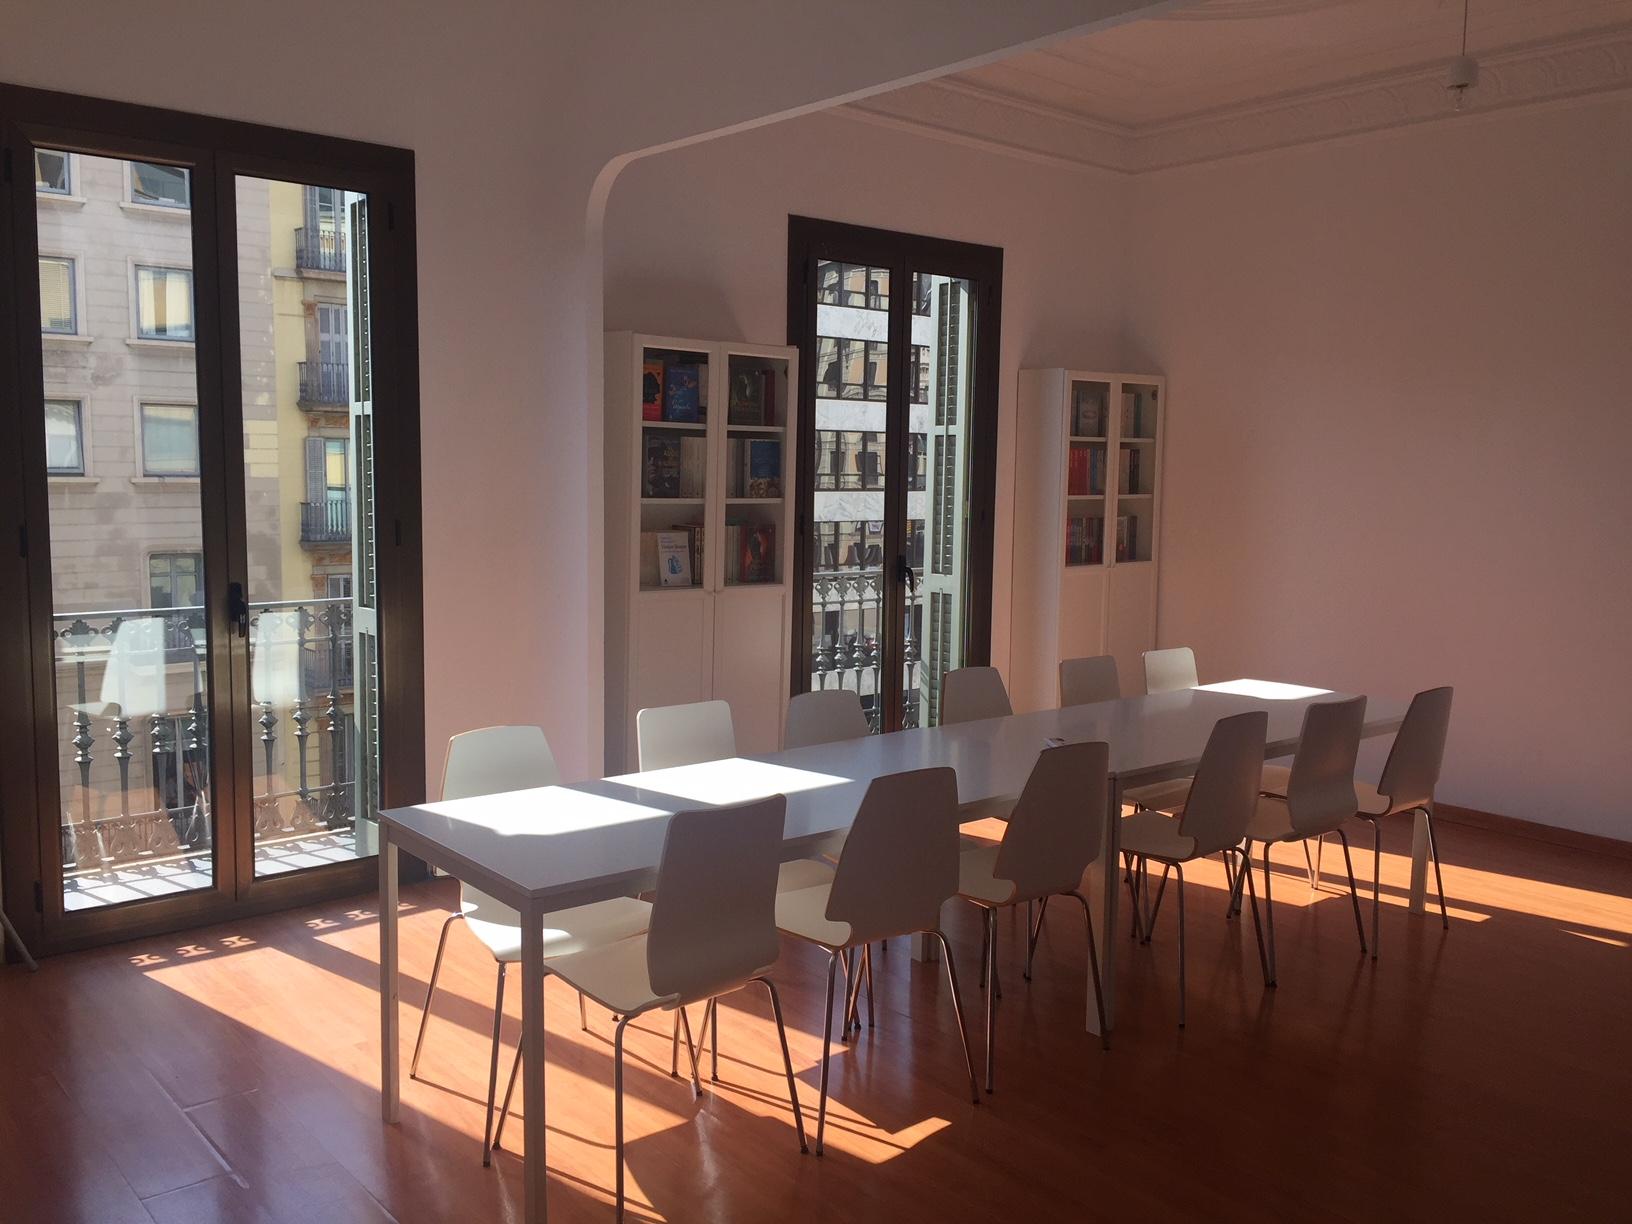 Máster de Edición de Taller de los Libros. Curso de Edición Profesional. Aprender edición en Barcelona.